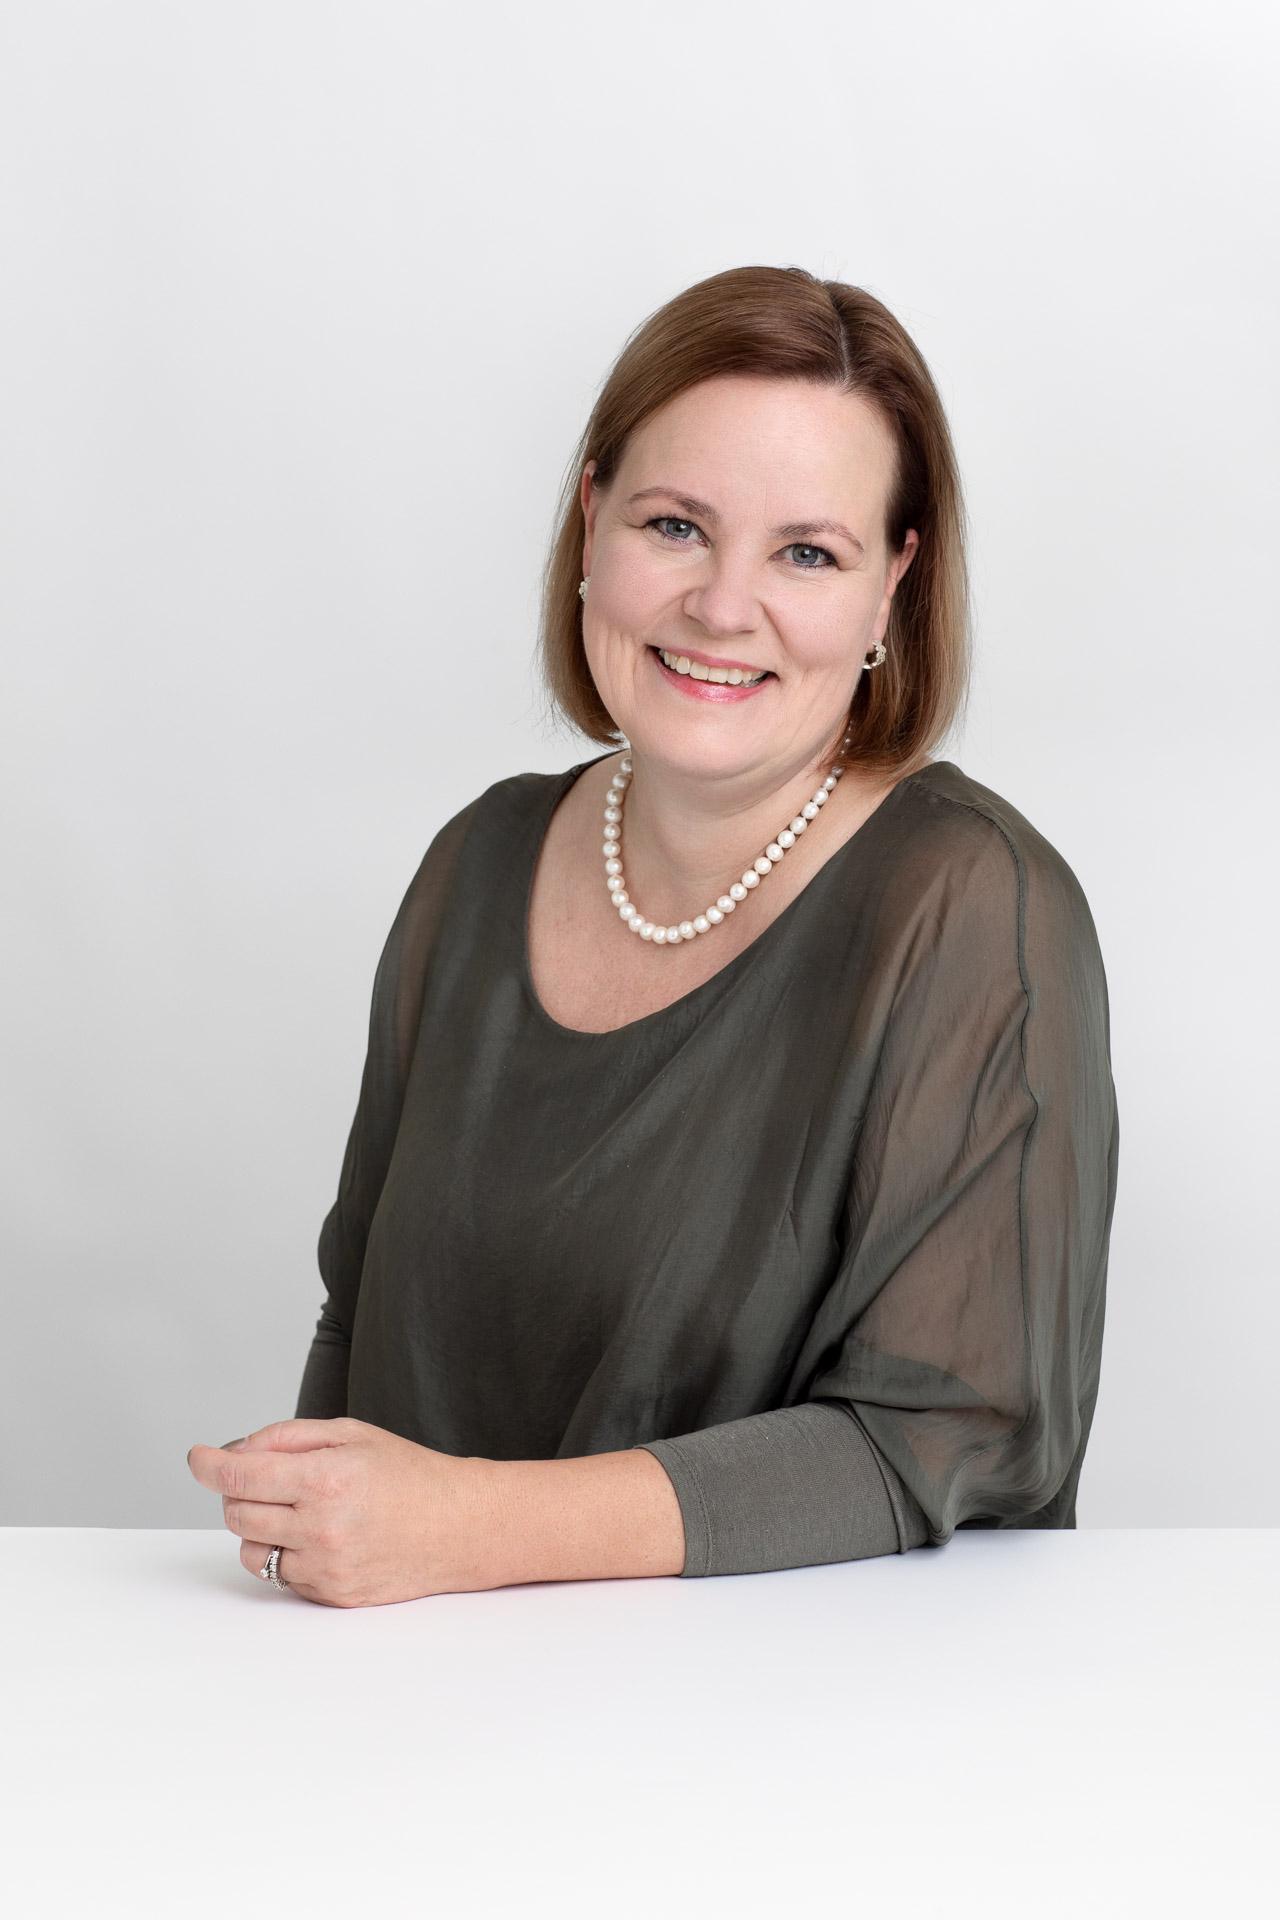 Johanna Hammarberg